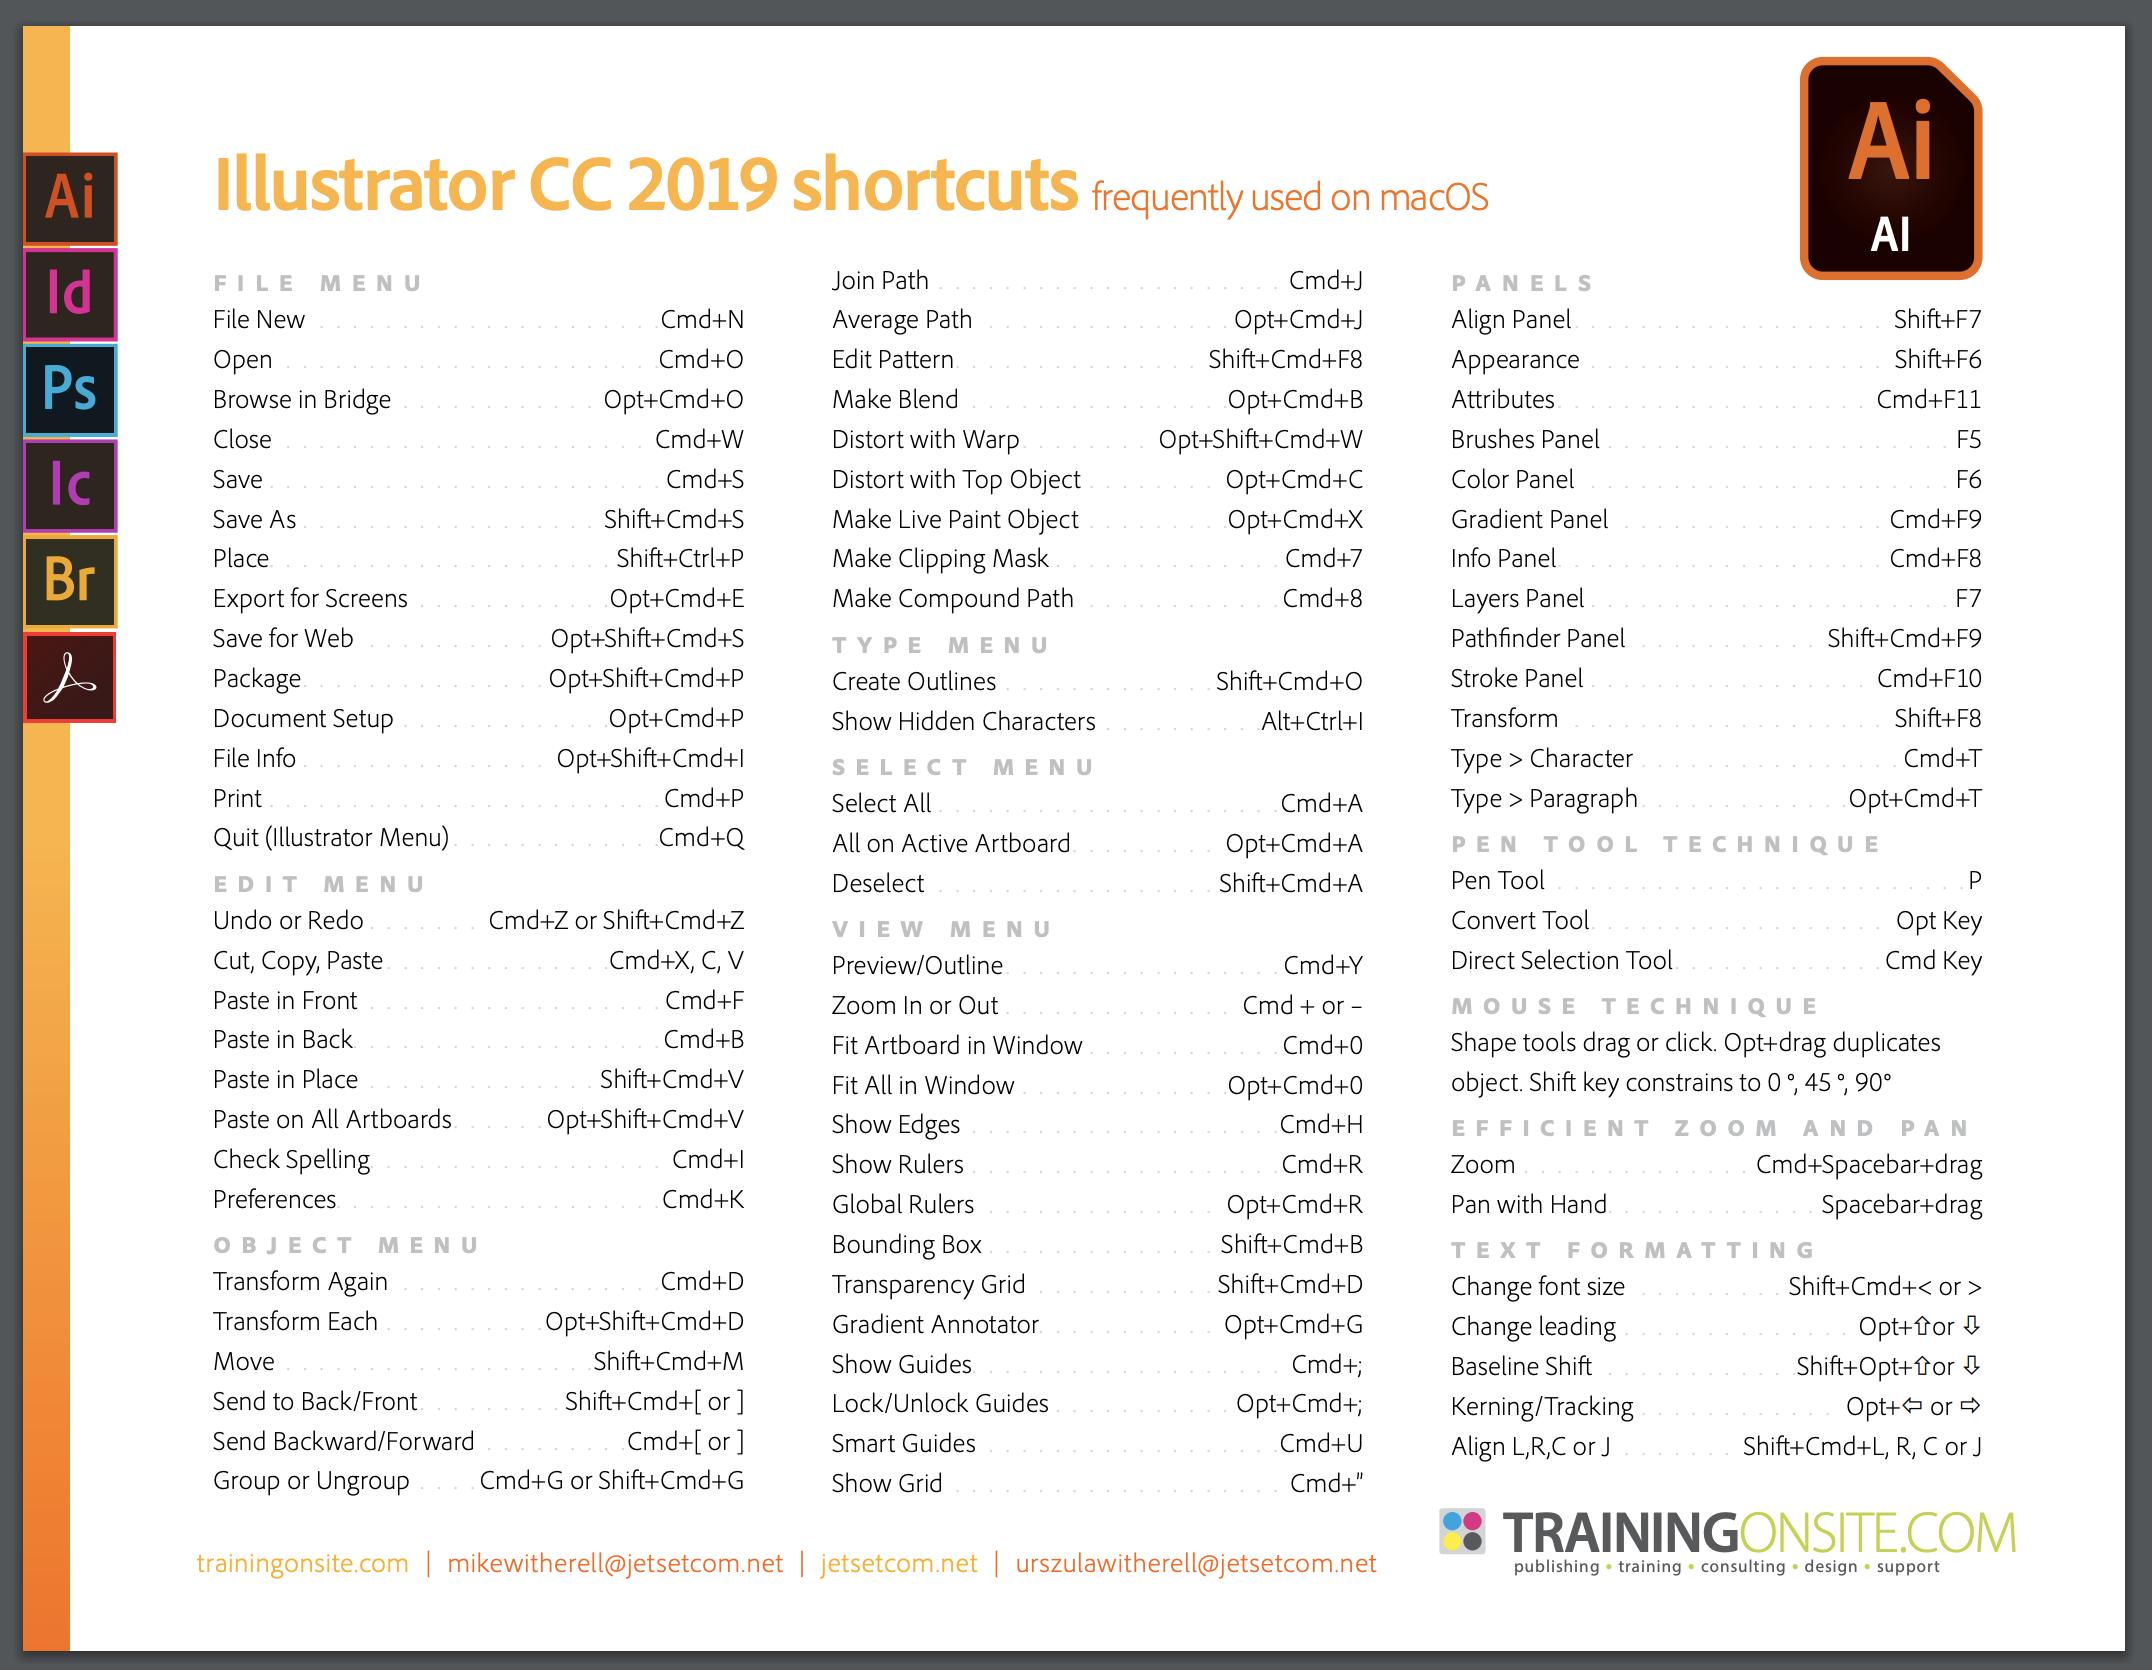 Illustrator CC 2019 - Keyboard Shortcuts